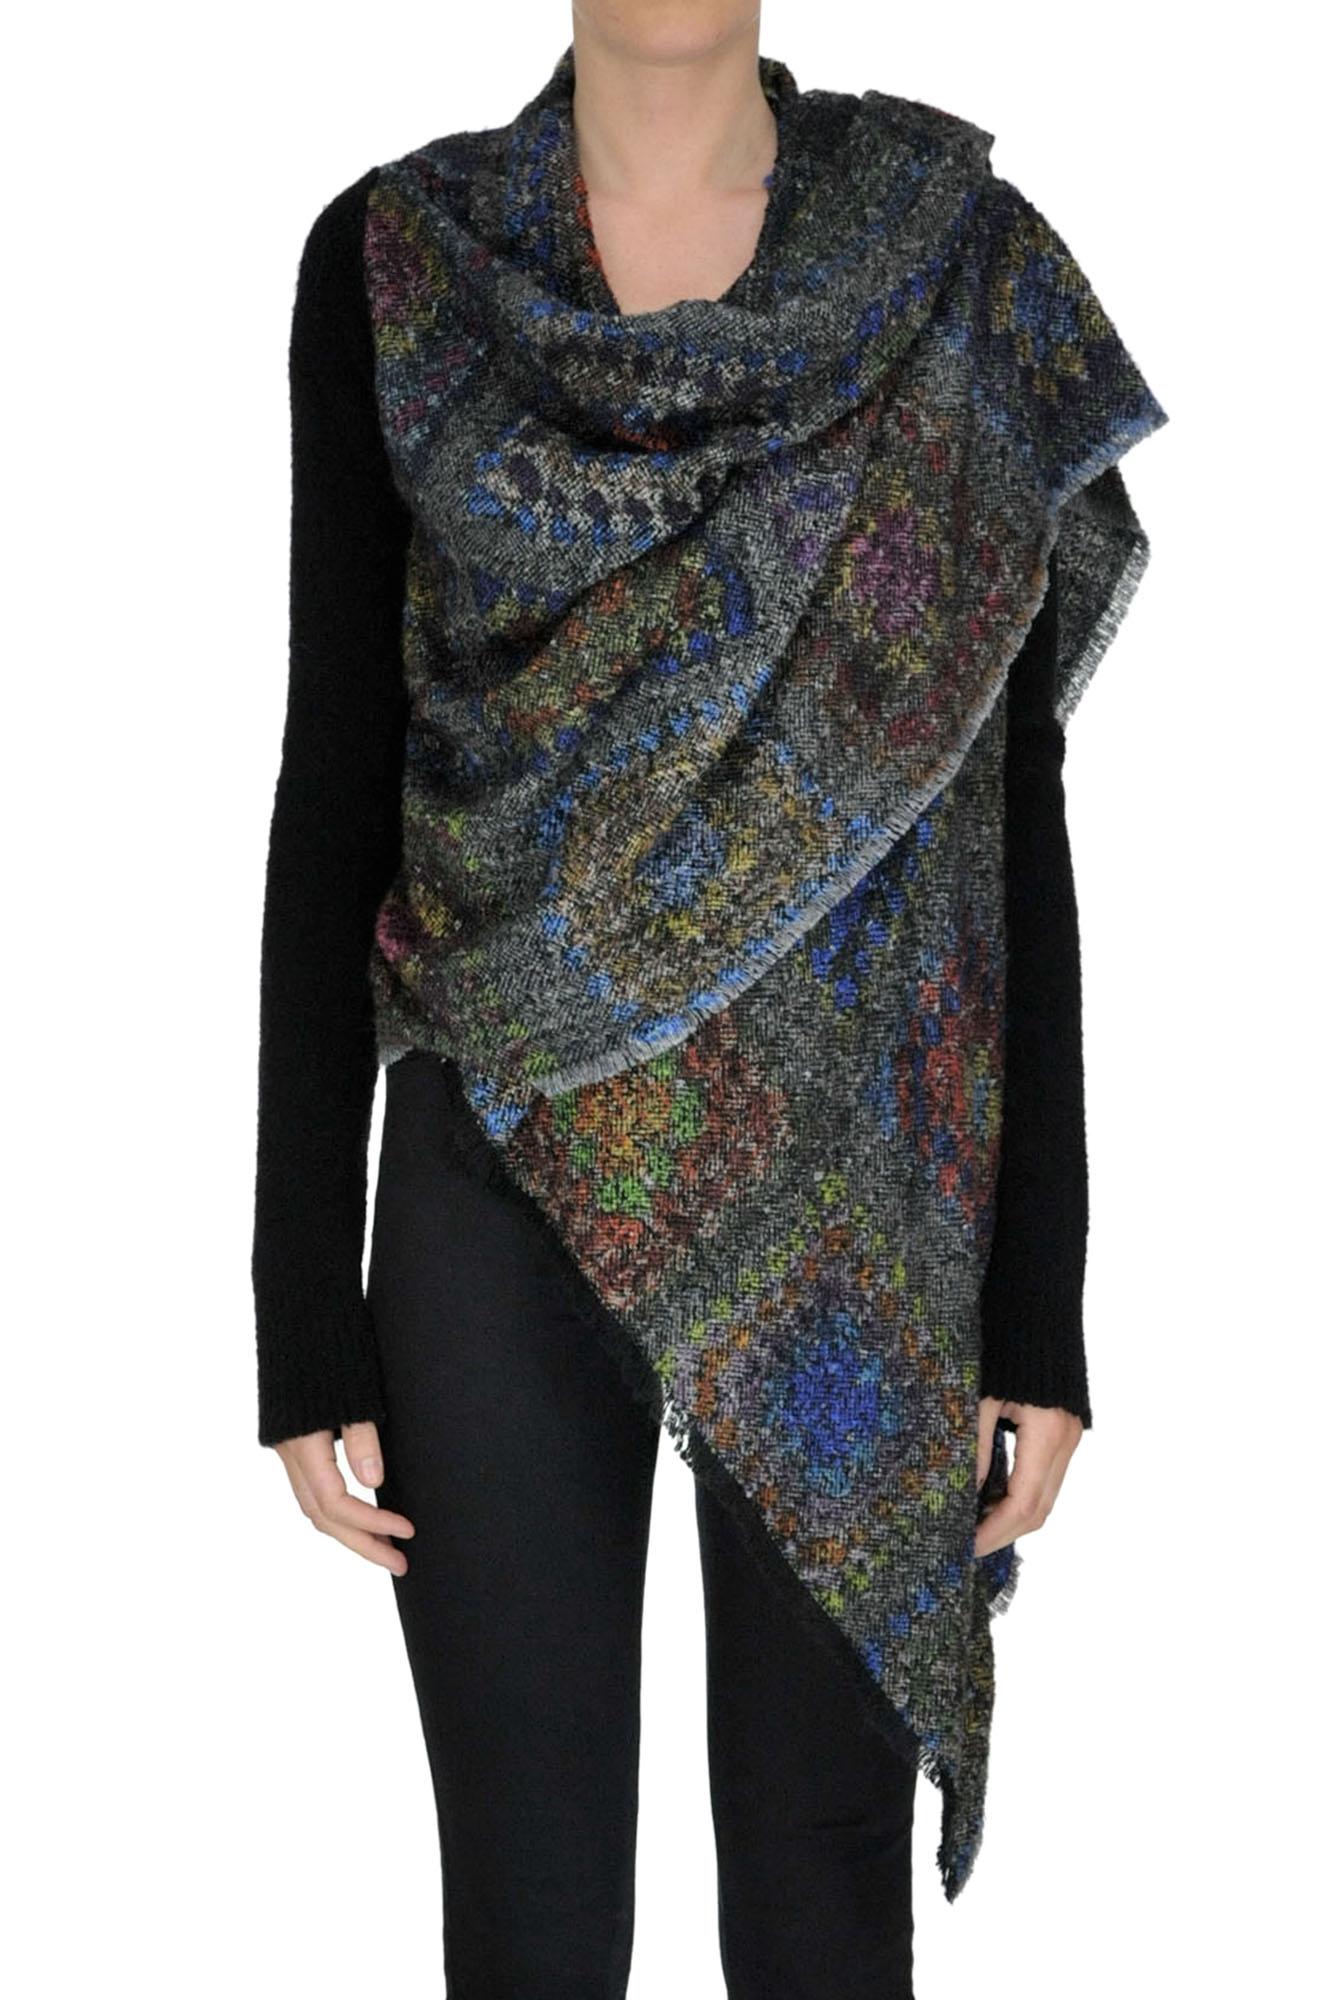 MONICA SARTI Texrtured Knit Cardigan in Multicoloured